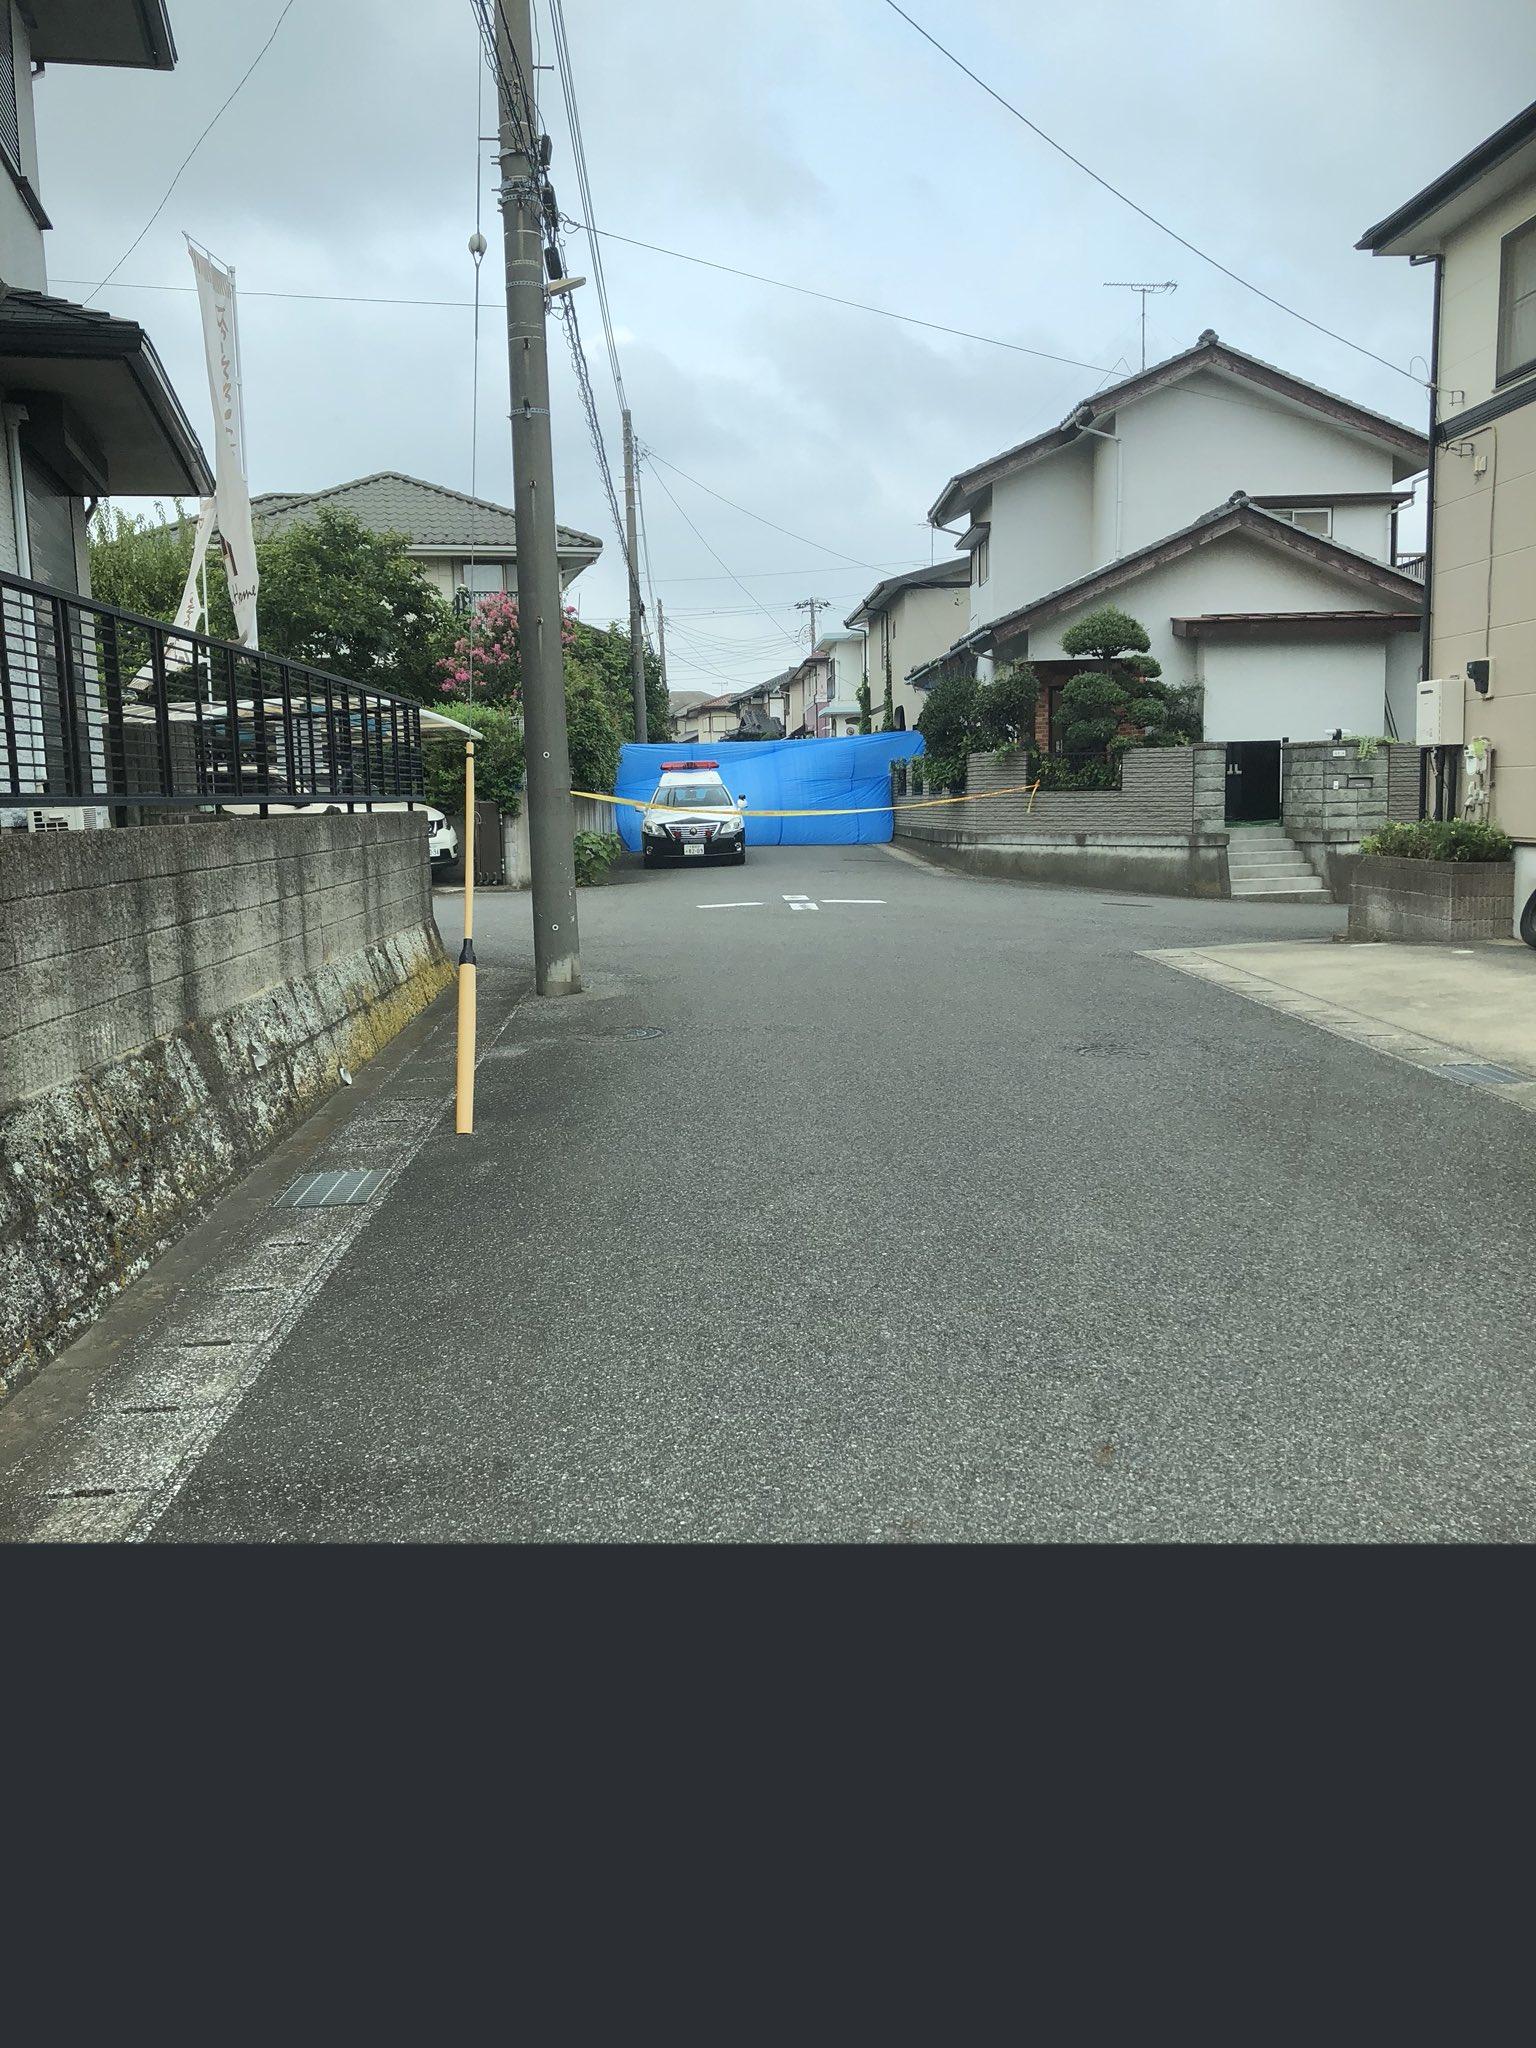 千葉市稲毛区萩台町で通り魔殺人未遂事件の現場画像